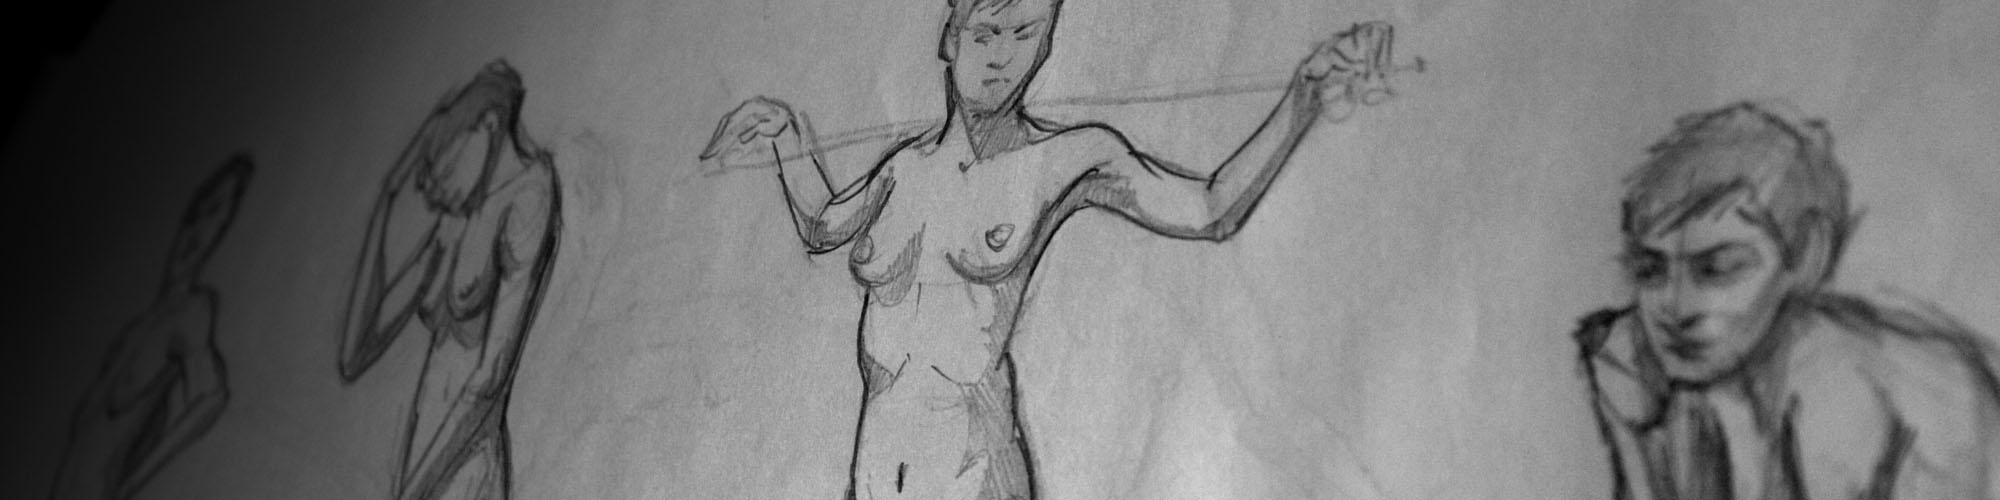 Dibujar figura humana